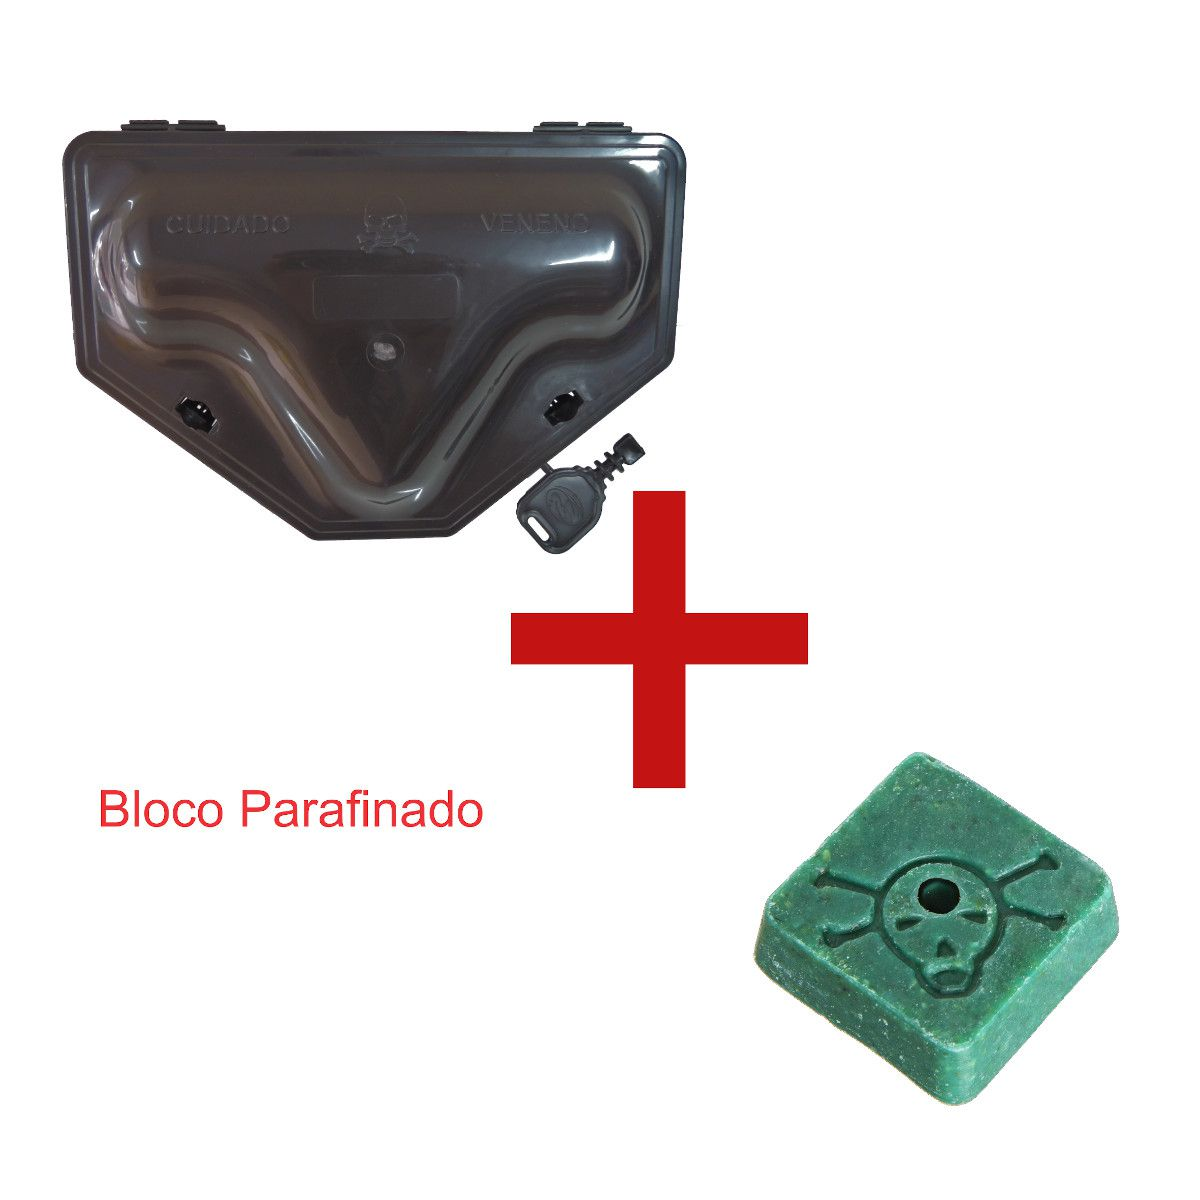 KIT 12 Porta Iscas Reforçado 2 TRAVAS Chave Ratoeira p/Ratos